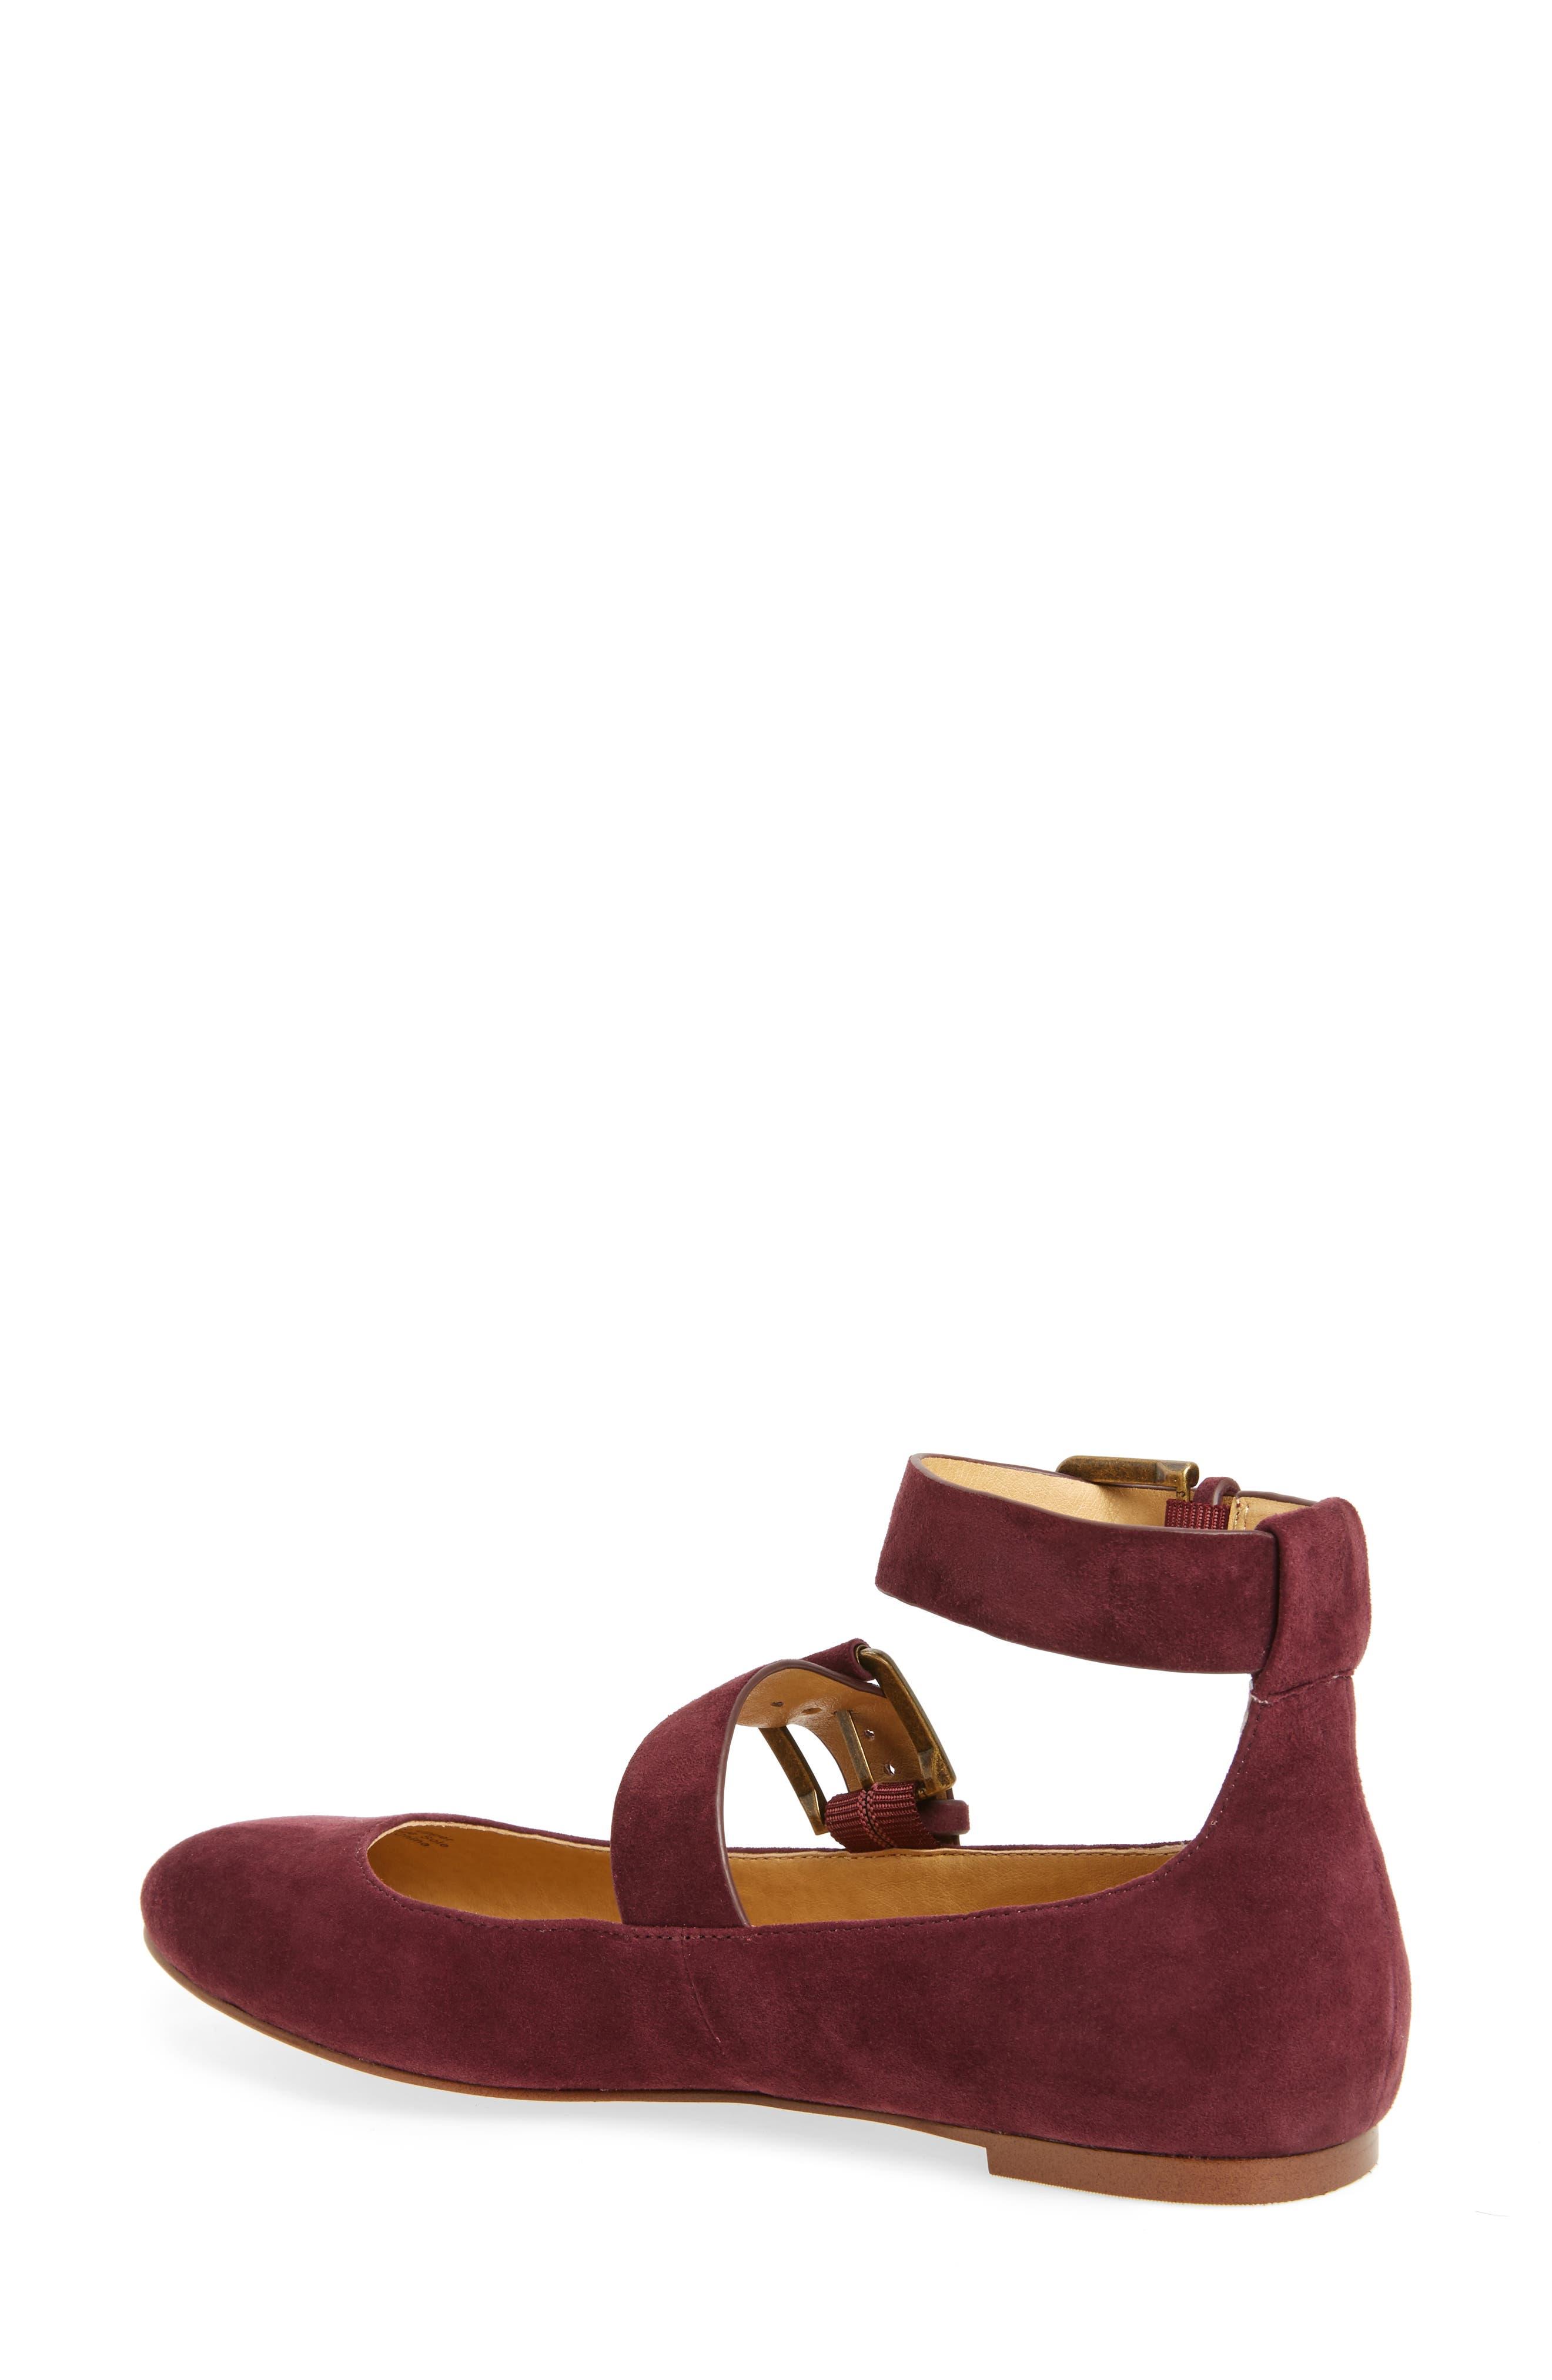 Dalenna Ankle Strap Ballet Flat,                             Alternate thumbnail 2, color,                             Wine Suede